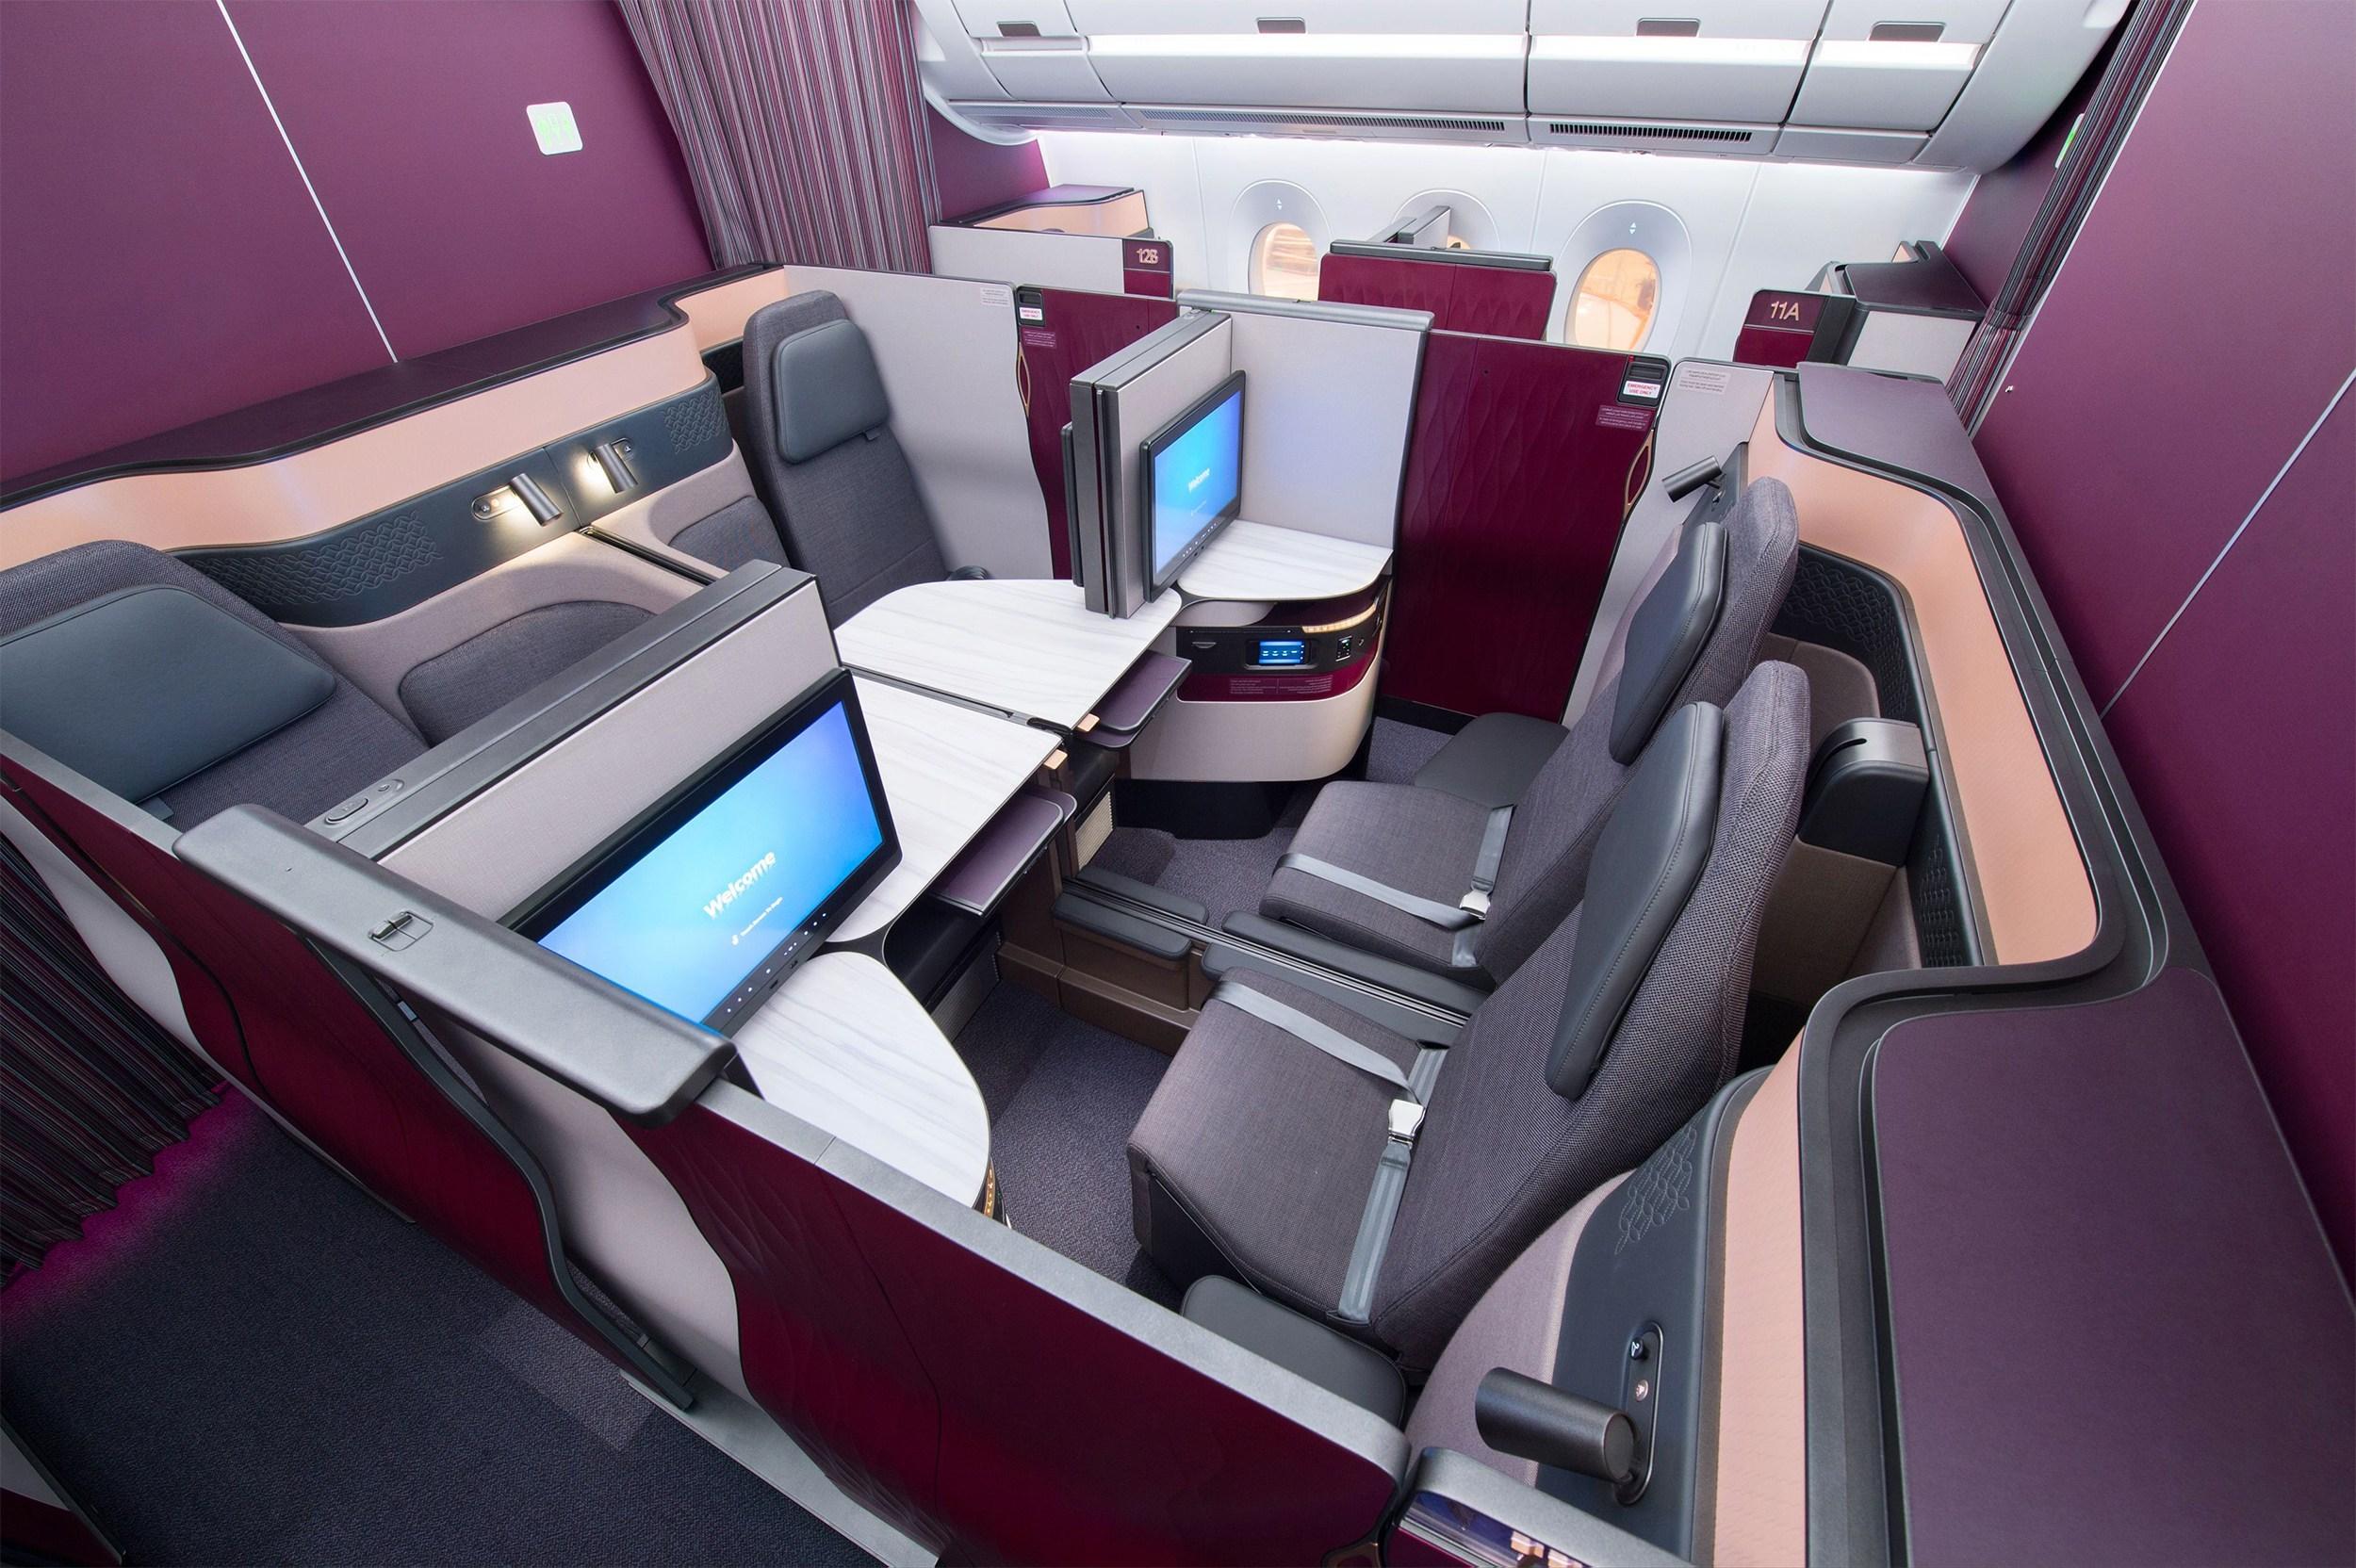 Fly Qatar Airways Qsuites on an Avios multi-carrier award!